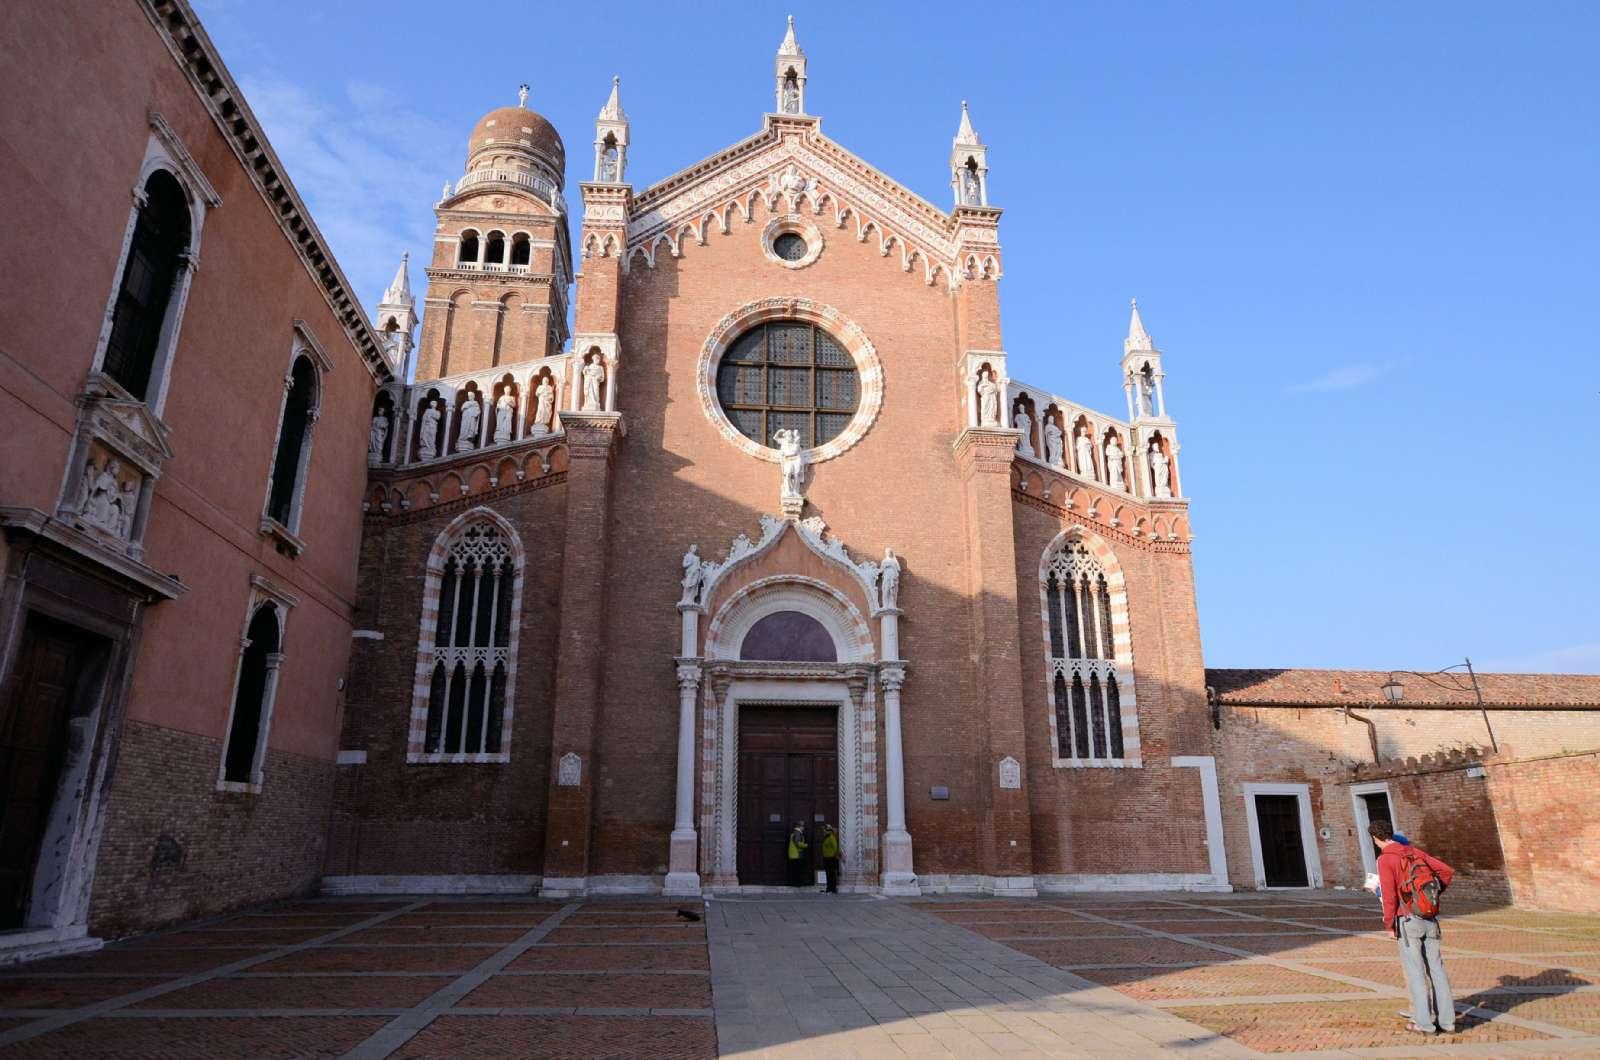 Kirken Madonna dell'Orto